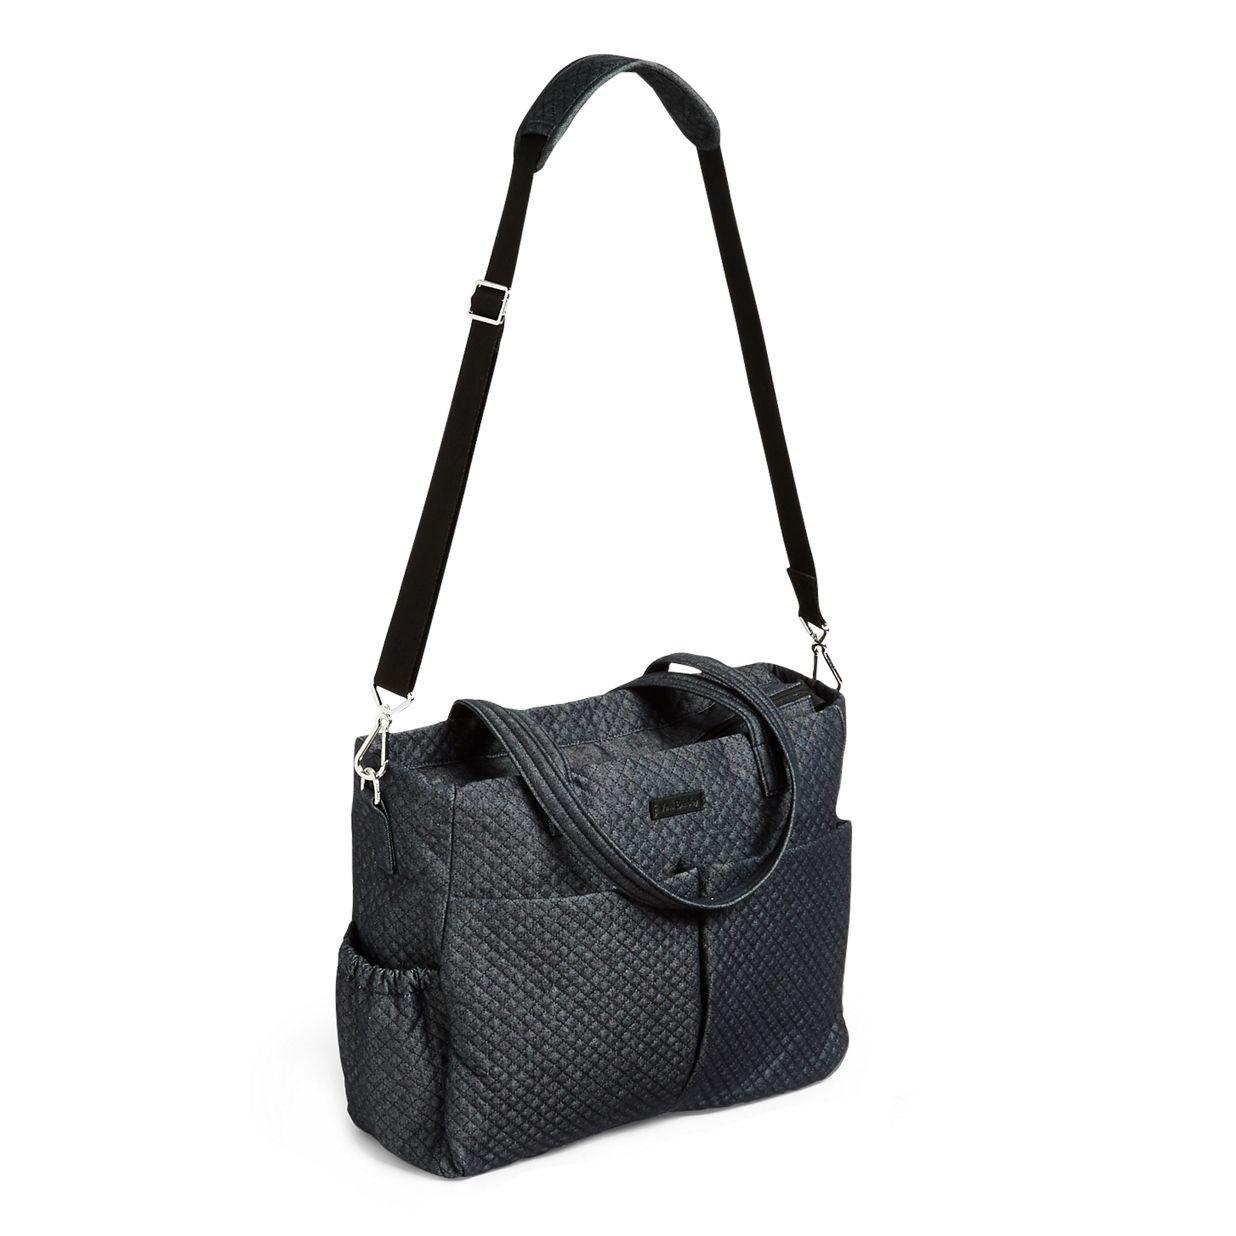 ... Image of Iconic Ultimate Diaper Bag in Denim Navy ... 6dd462e995075